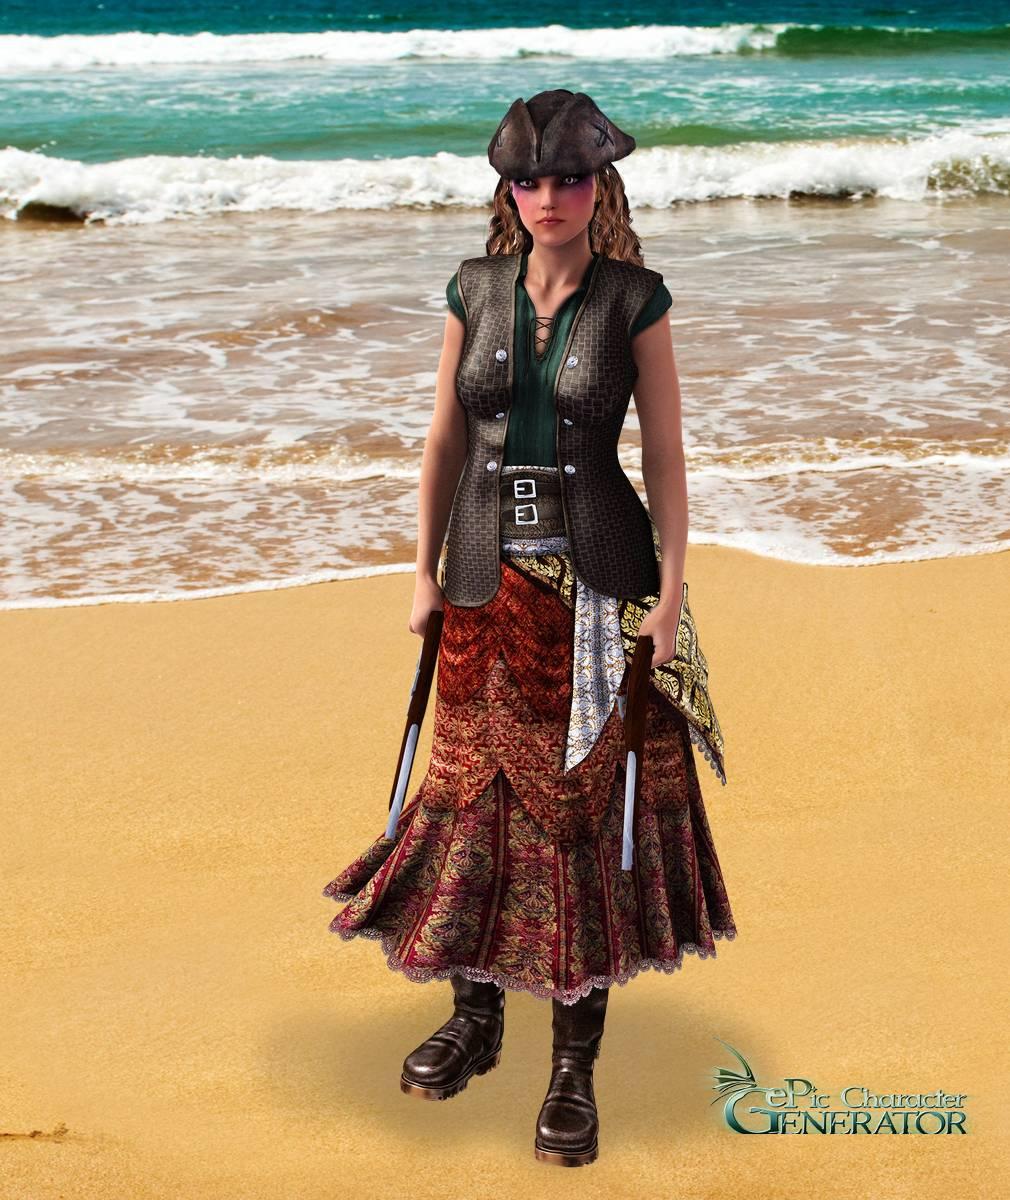 ePic Character Generator Season 2 Female Pirate Screenshot 11